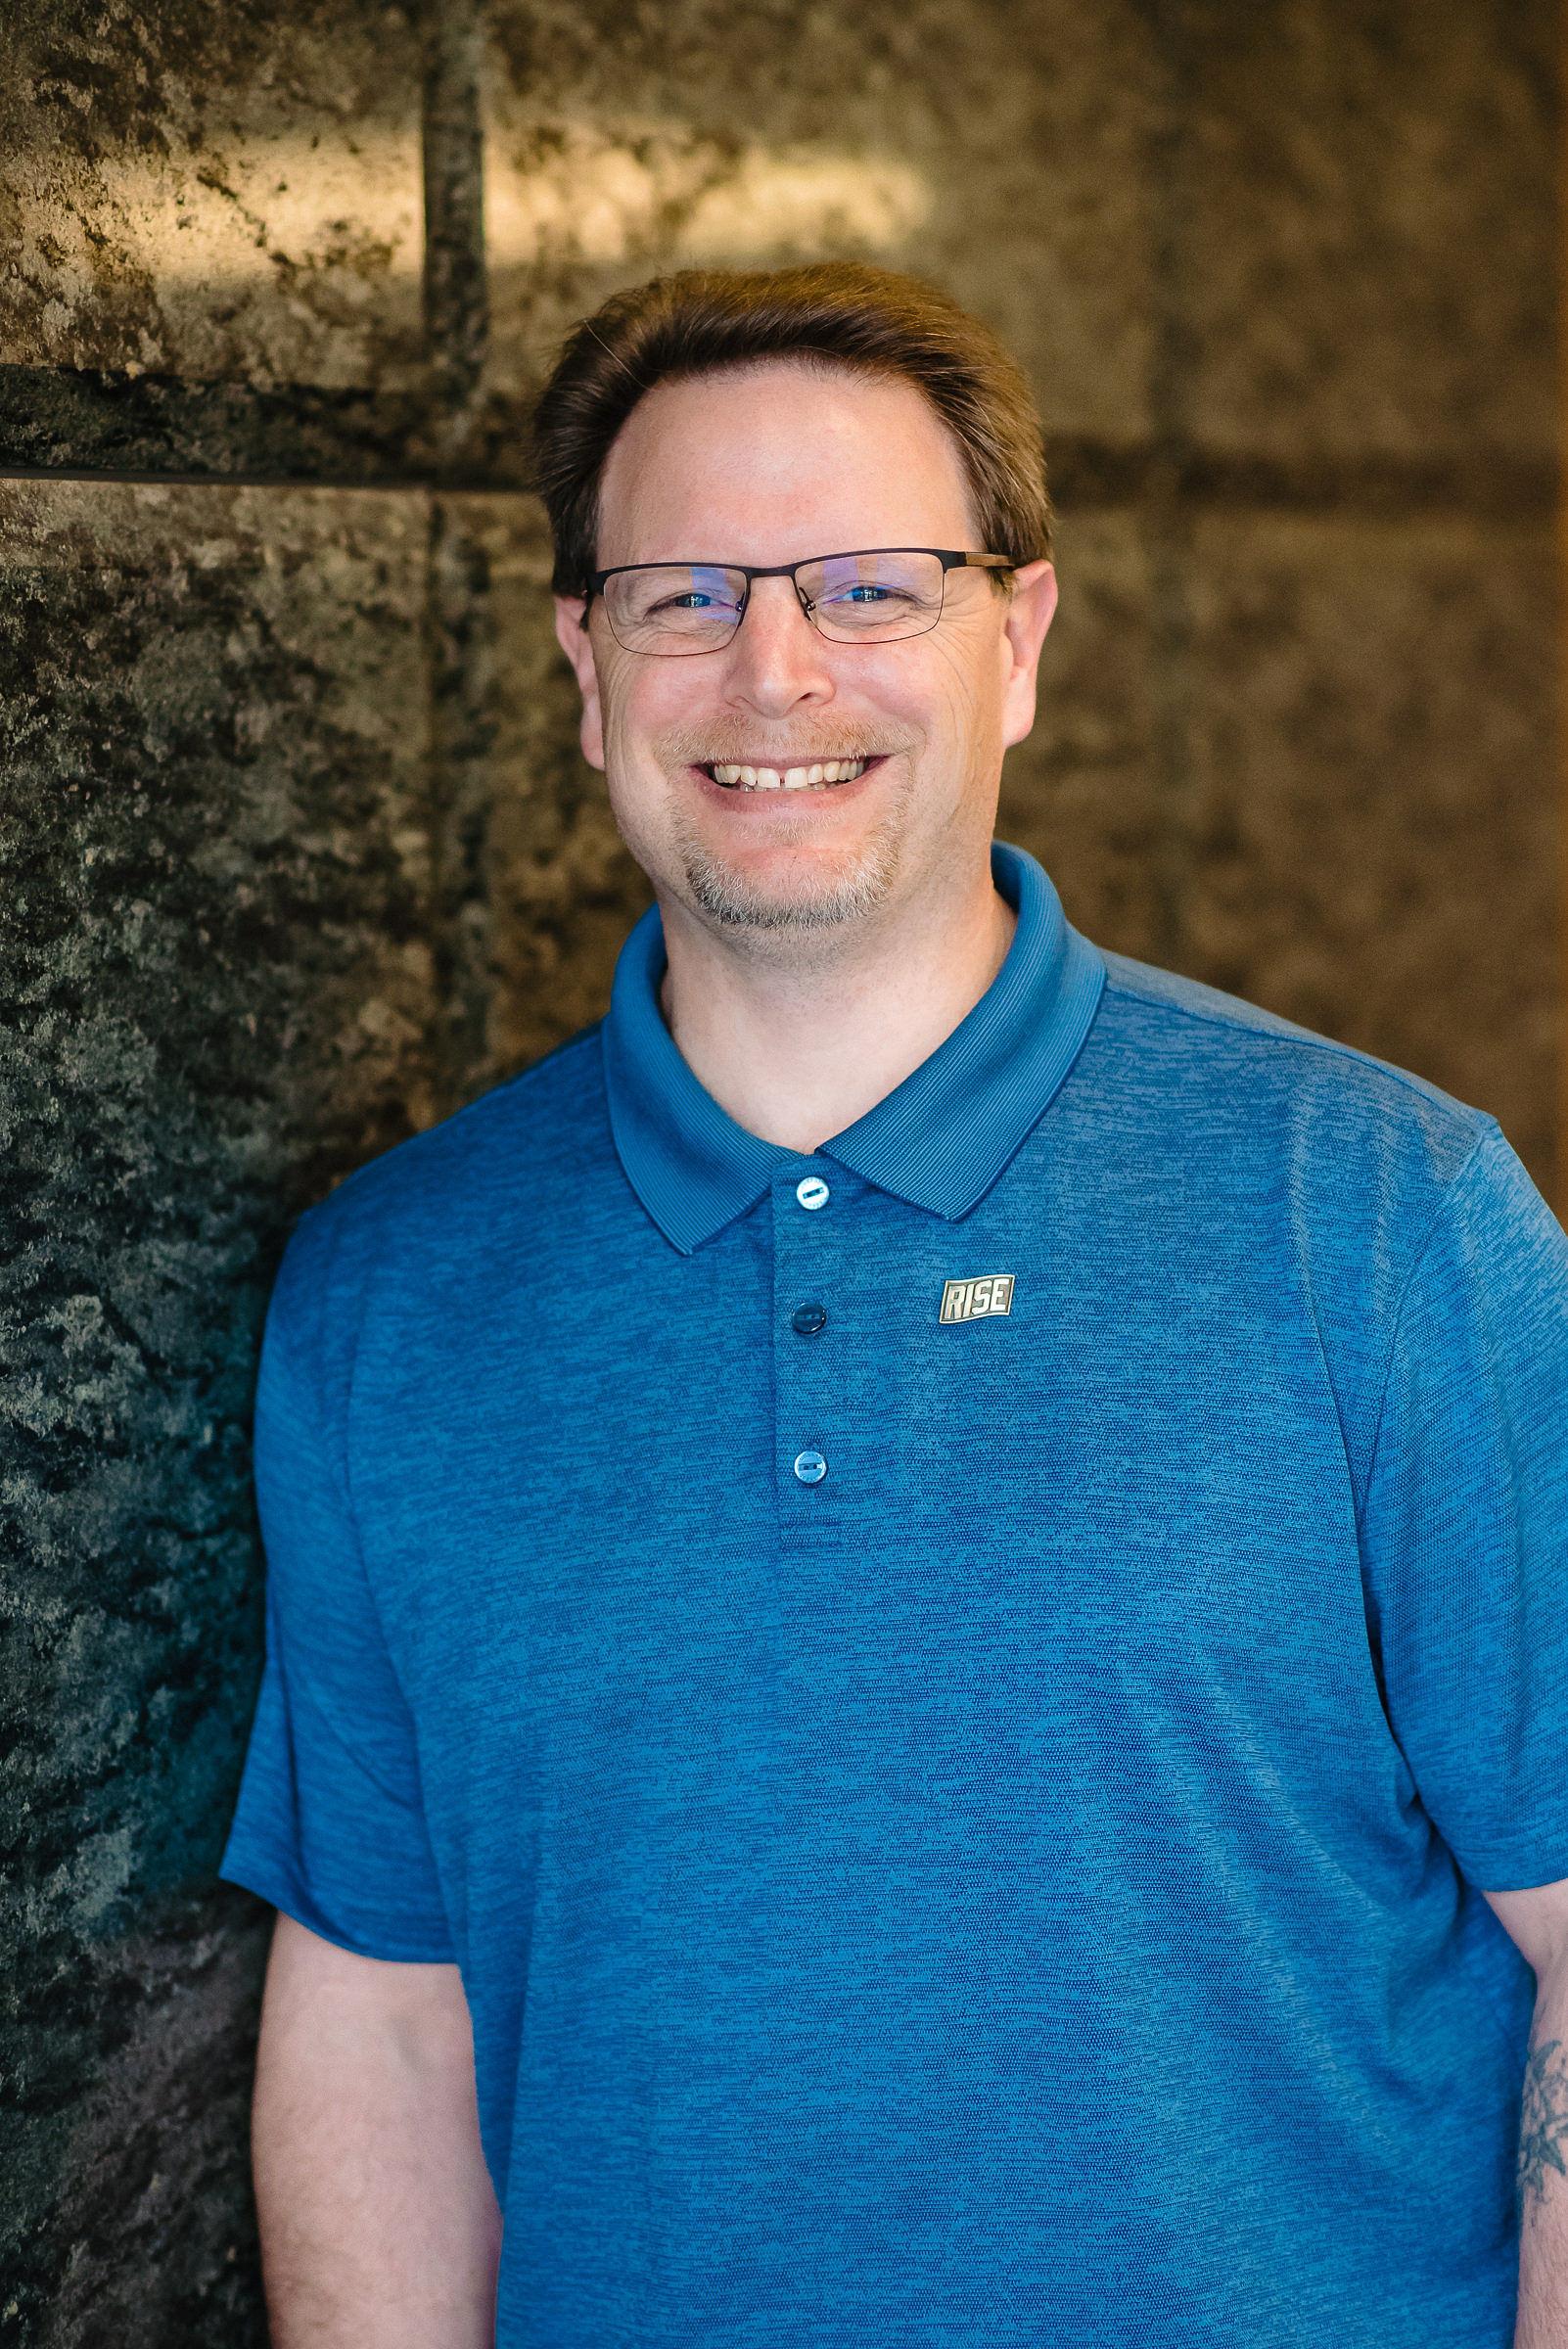 Jason Kotas, Reentry Specialist